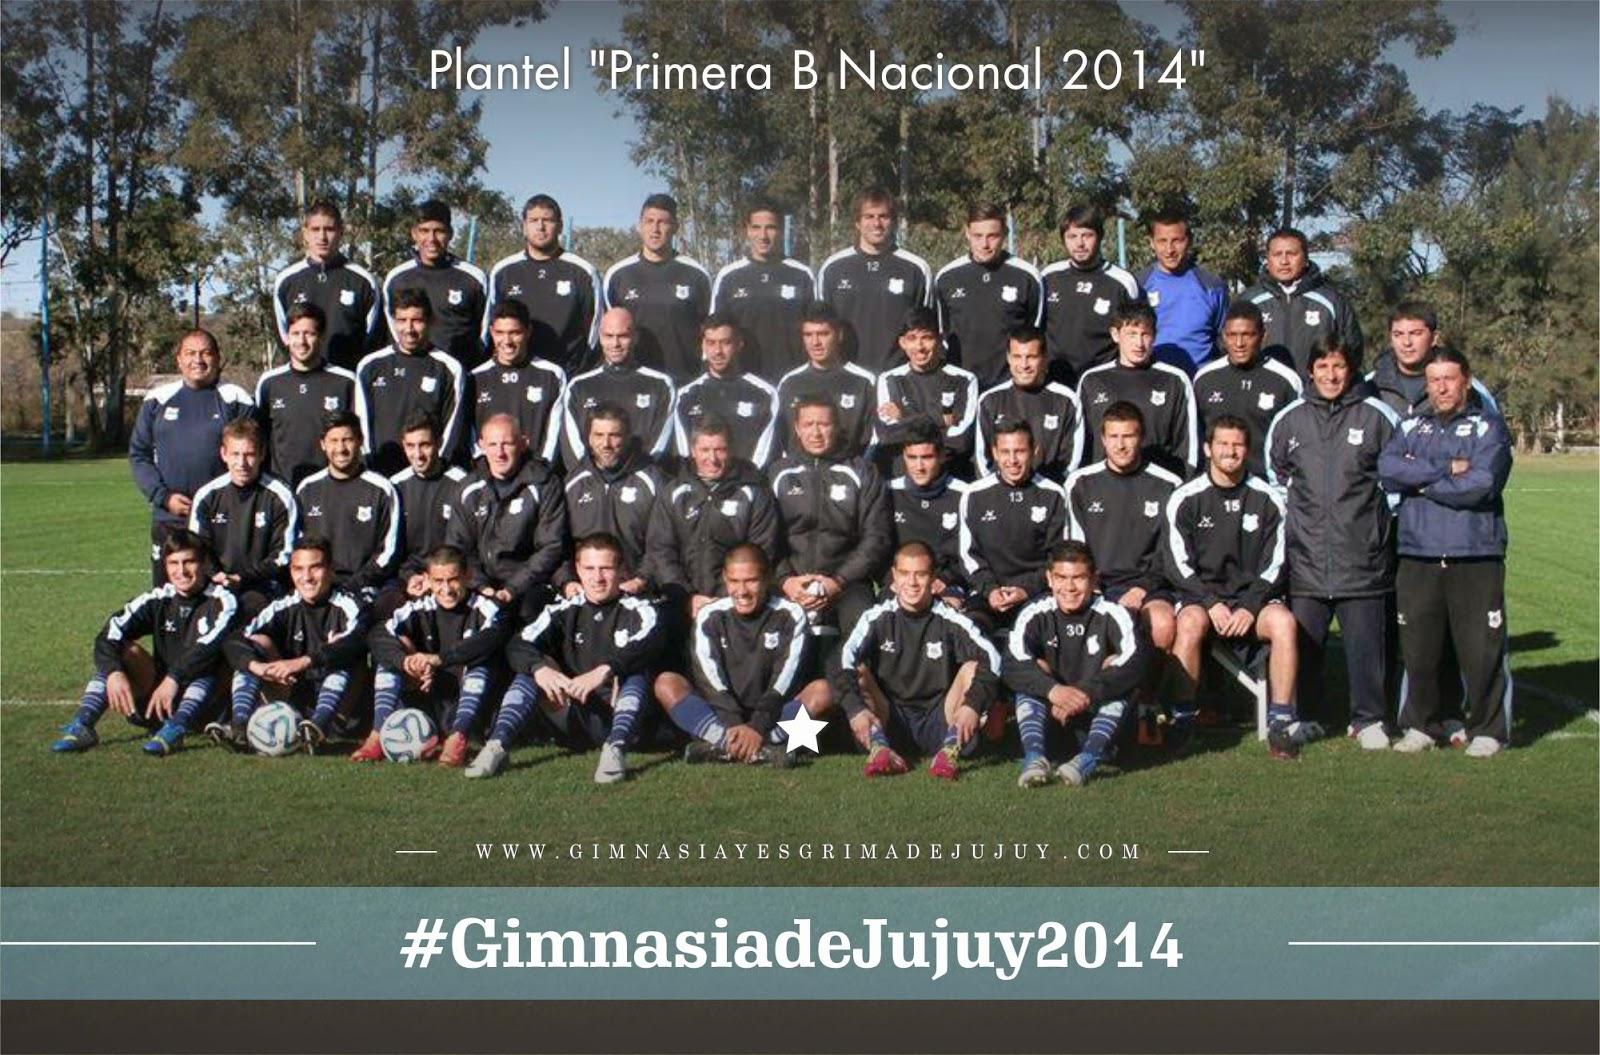 Gimnasia de Jujuy, plantel 2014